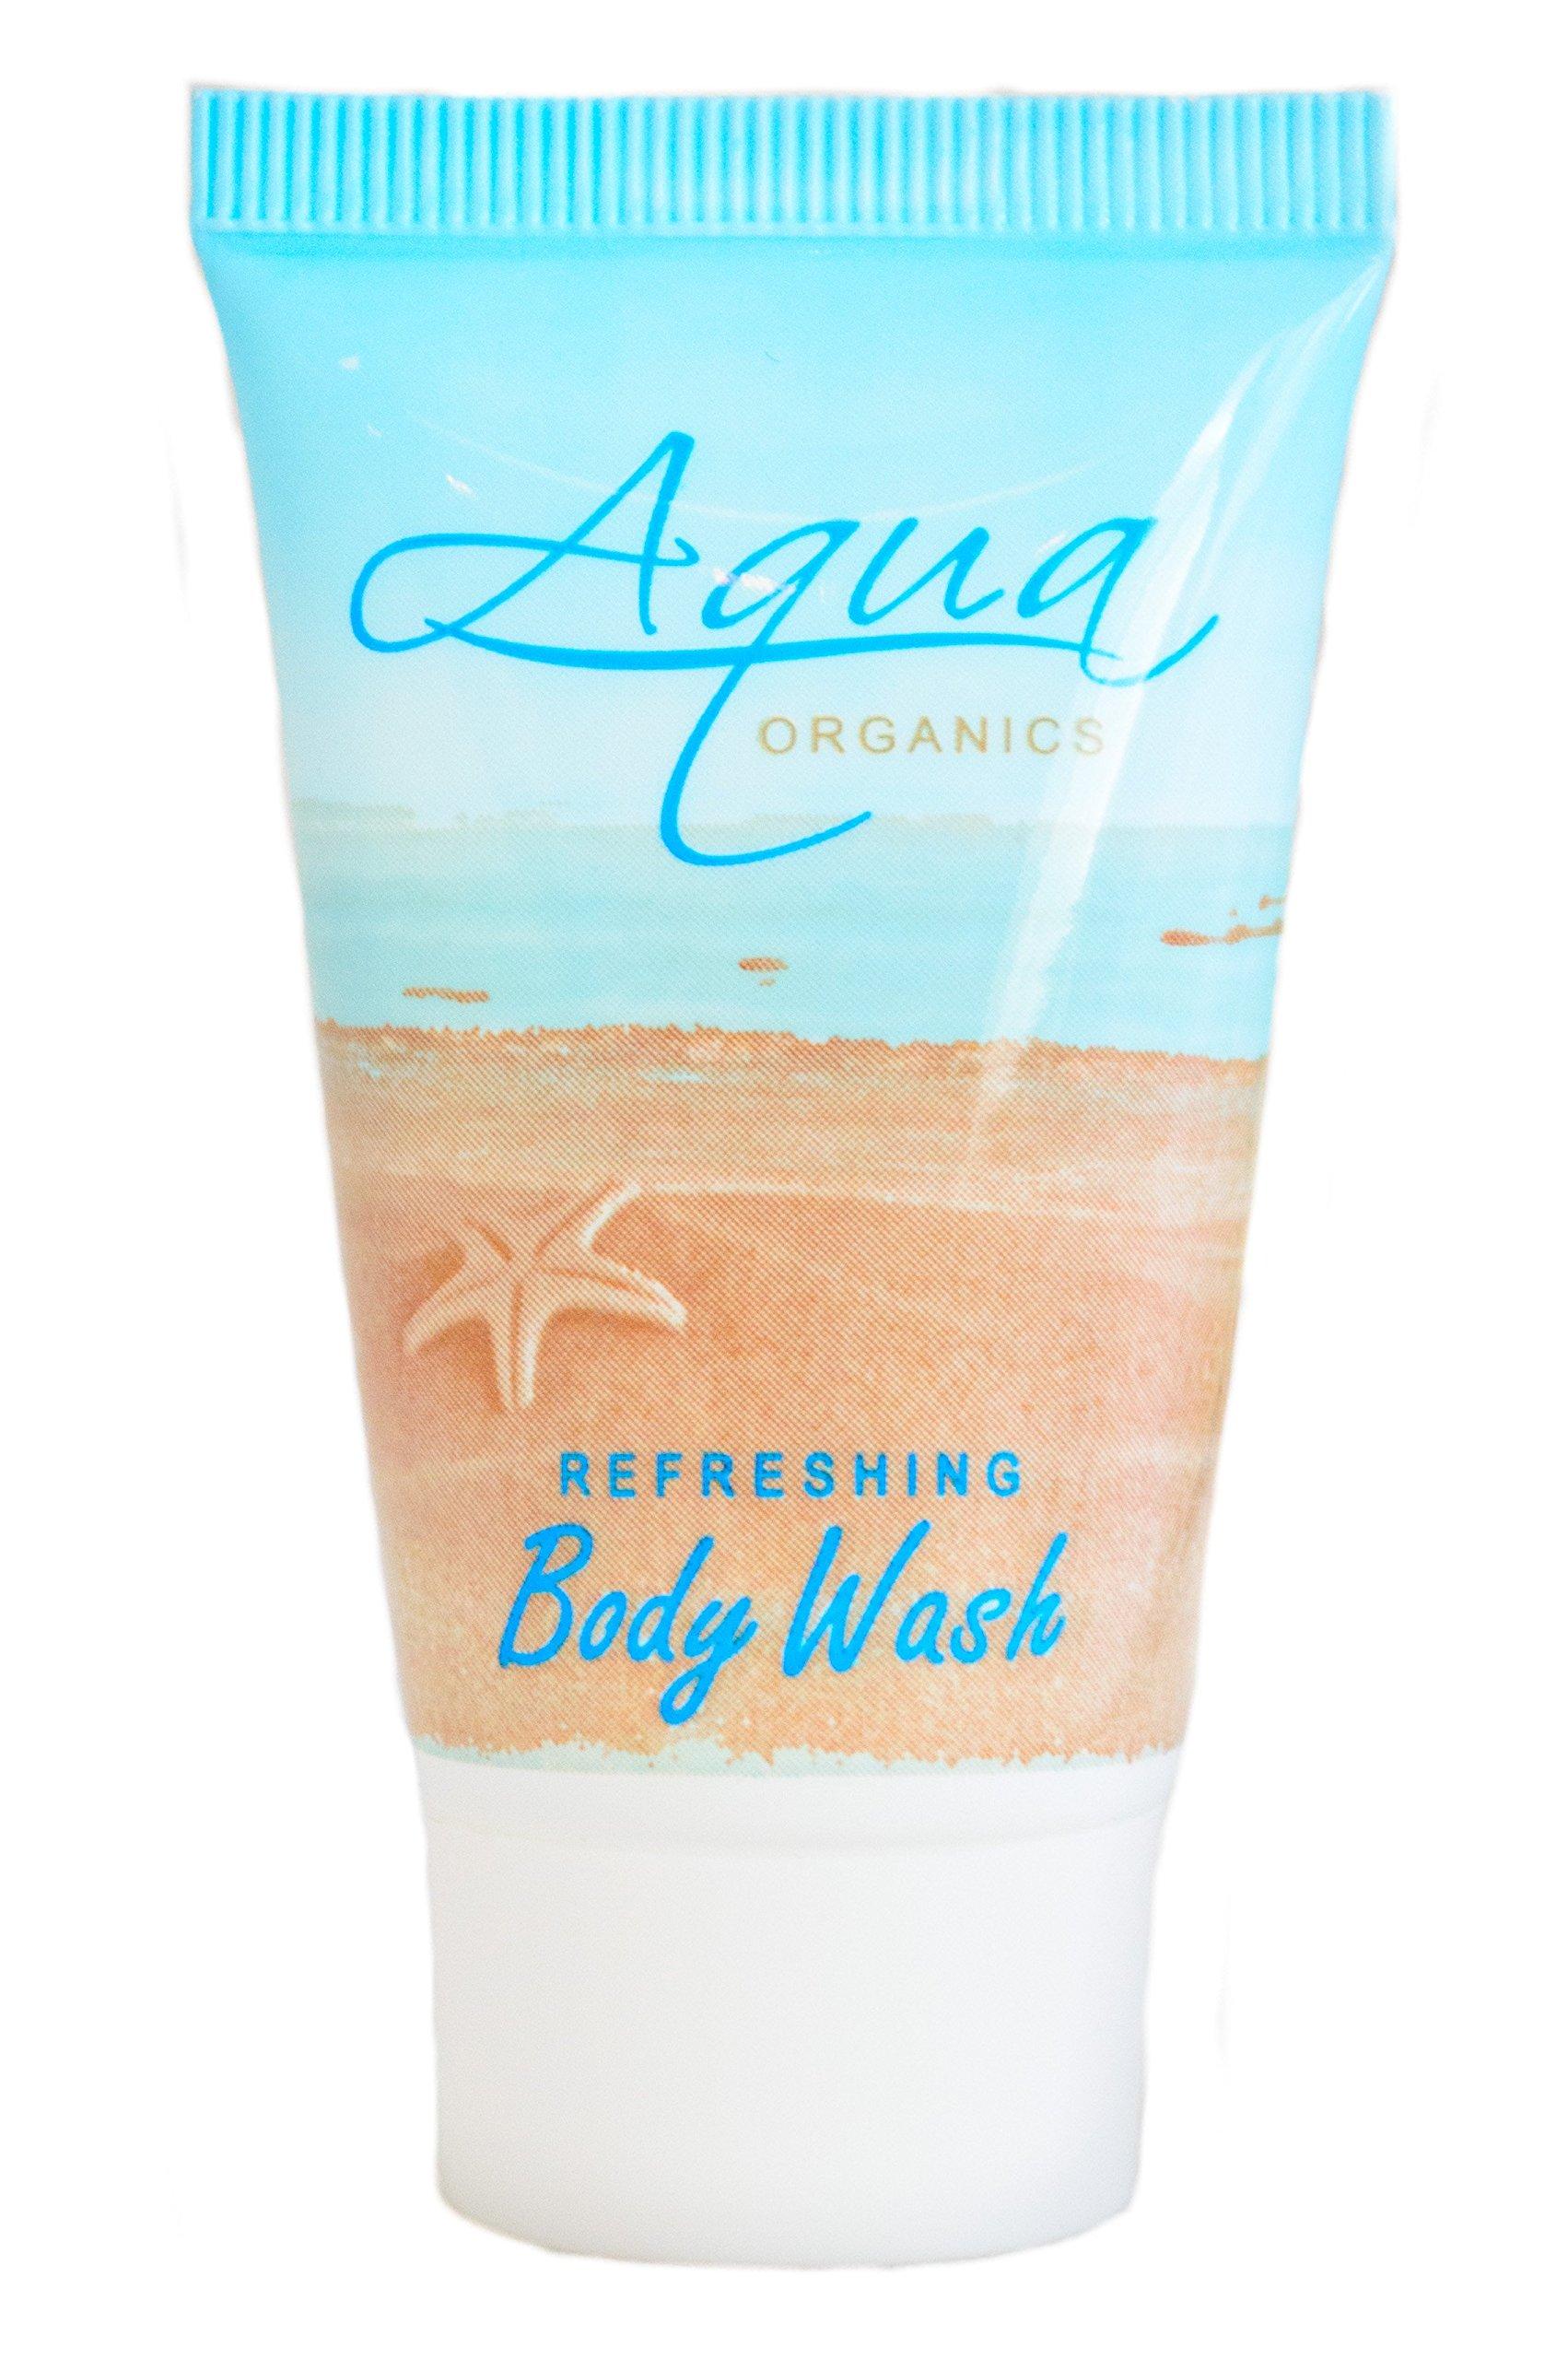 Aqua Organics Body Wash, 1 oz. Hospitality/Travel Size Tube, Enriched with Pure Aloe and Organic Olive Oil (Case of 300)